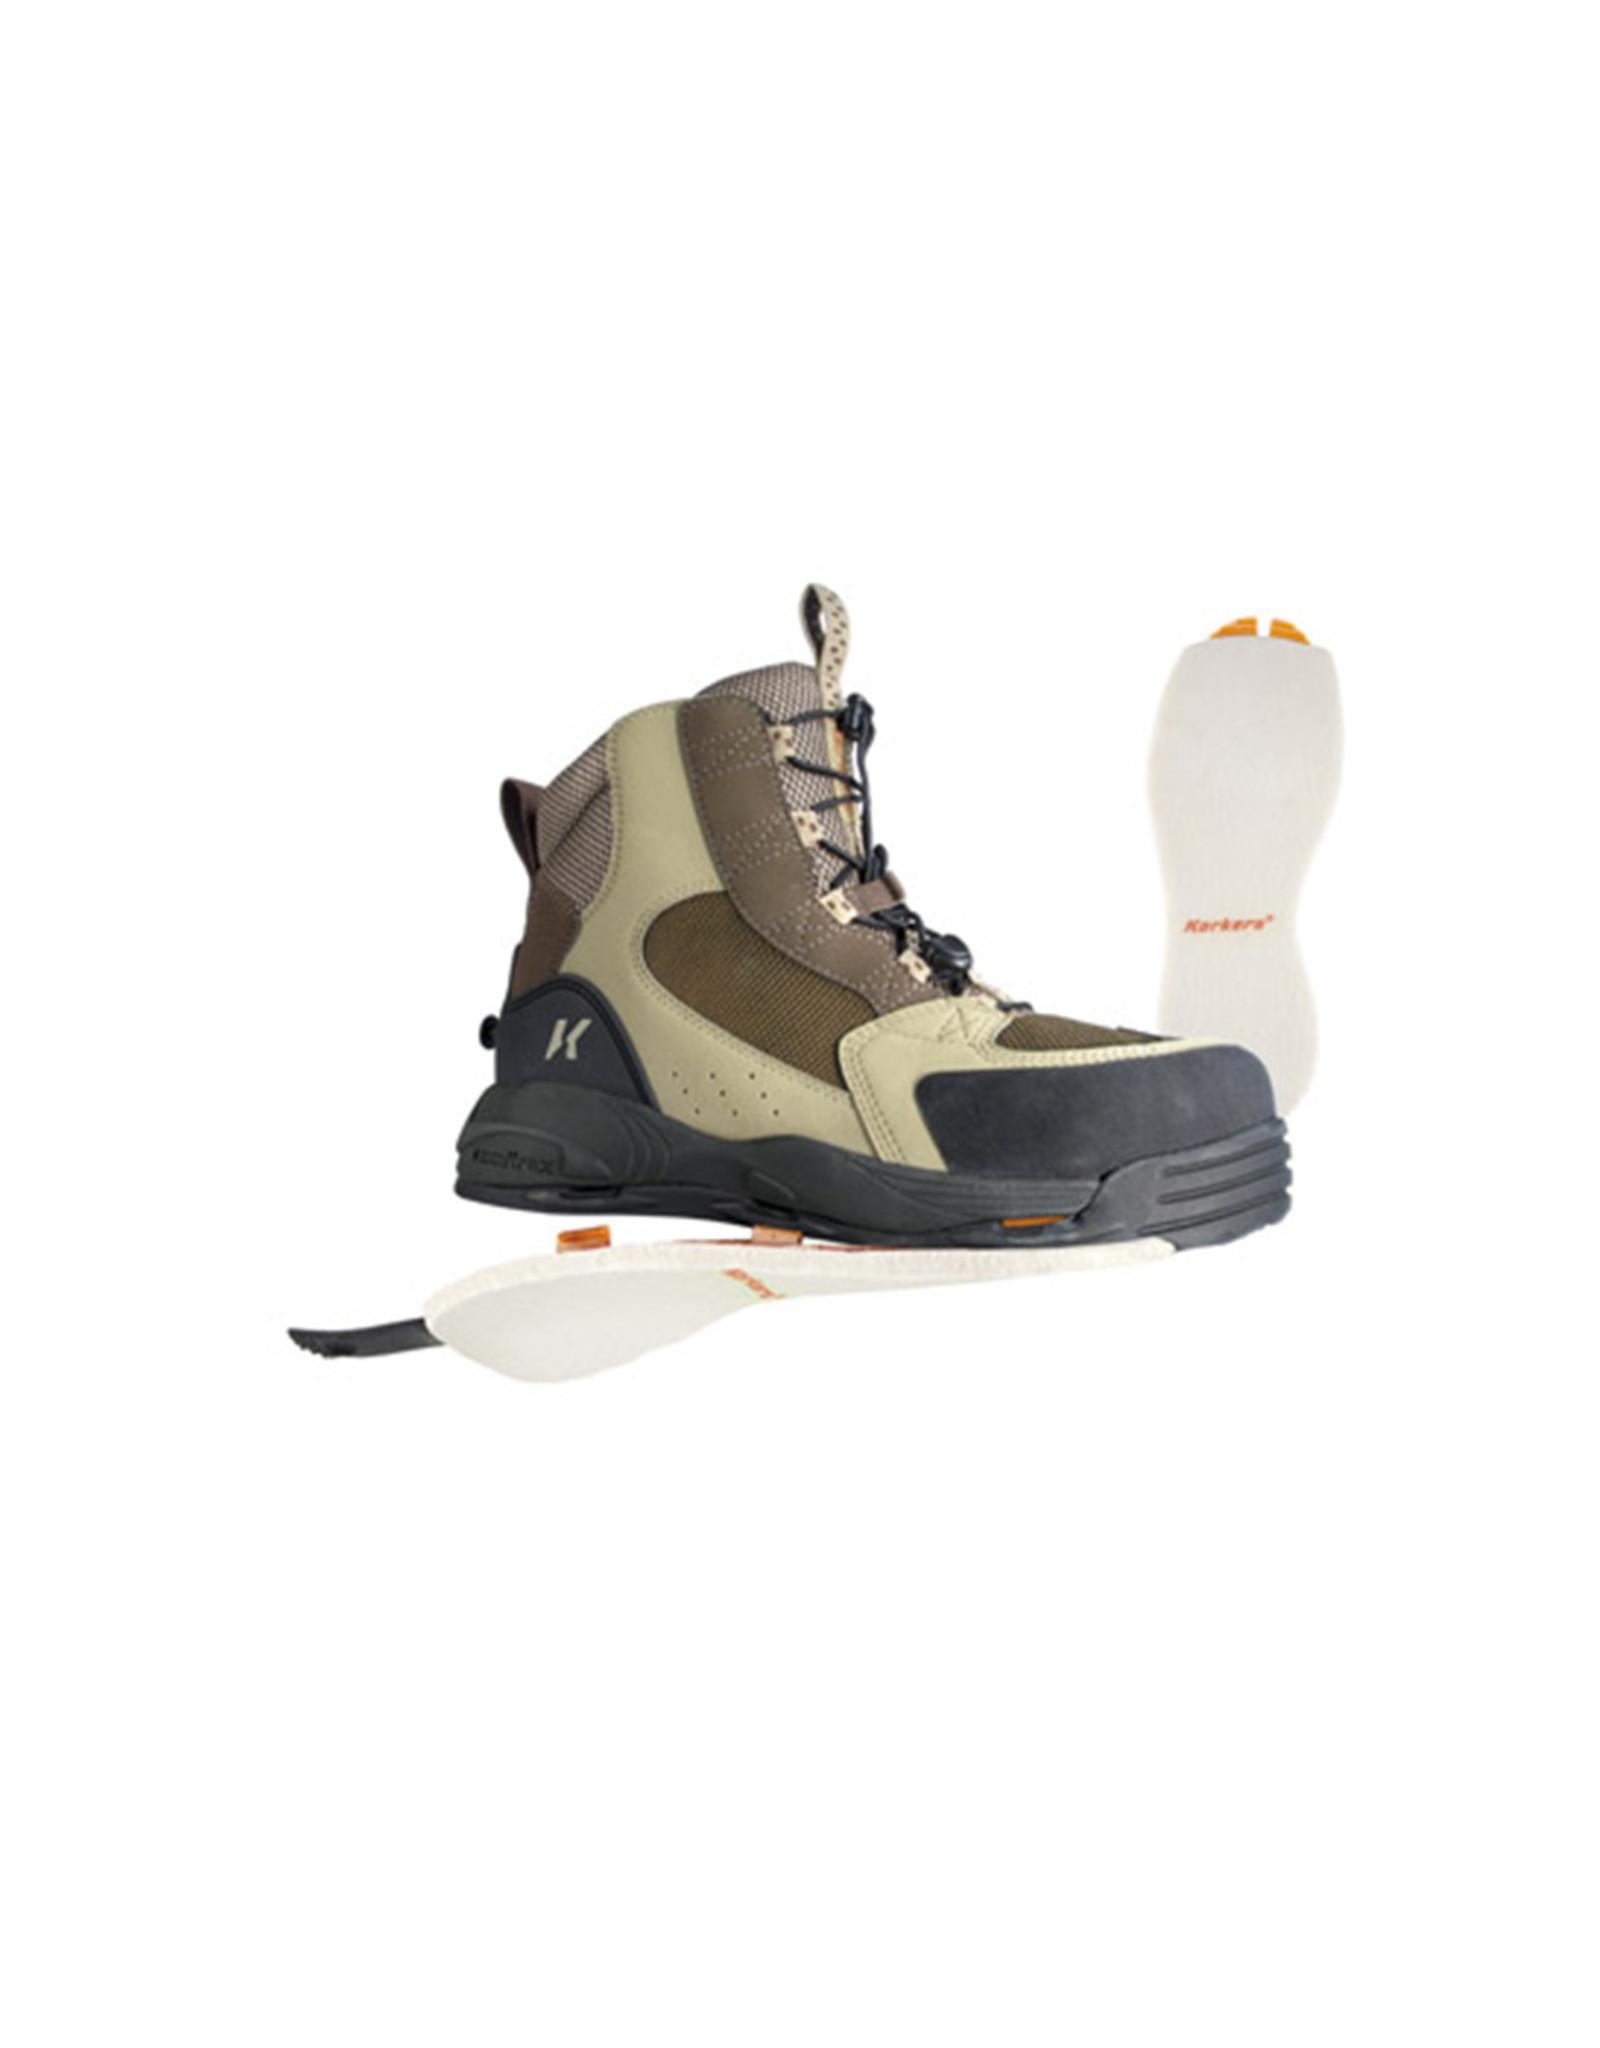 Korkers Korkers - Redside Wading Boots - Felt Sole